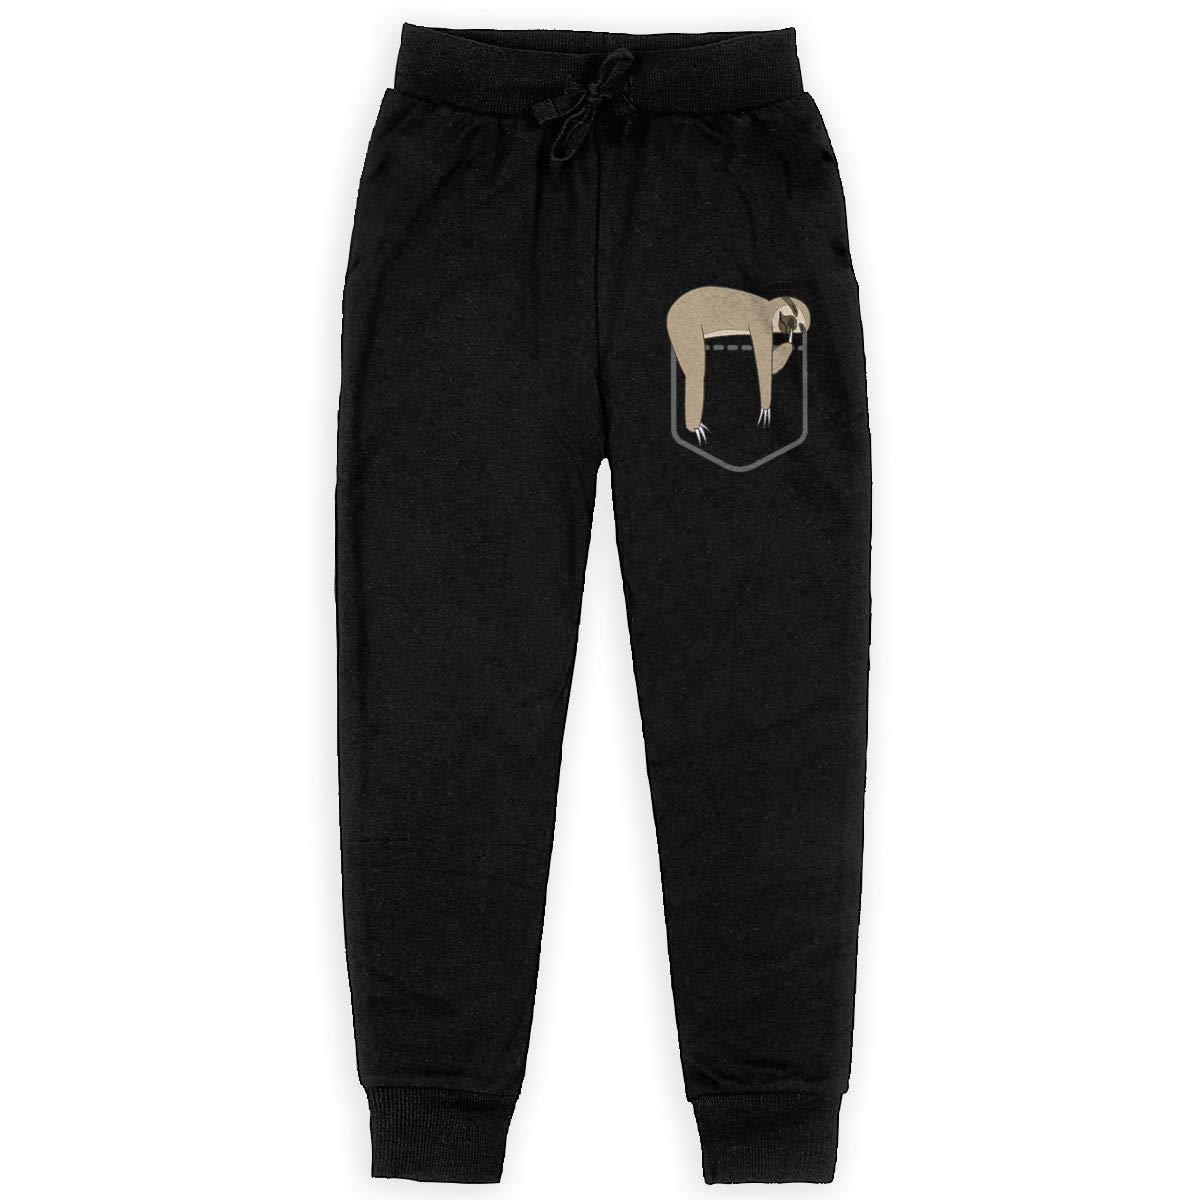 Roli-Land Unisex Teens Pocket Sloth Elastic Gym Sweatpants for Boys Gift with Pockets Pajamas